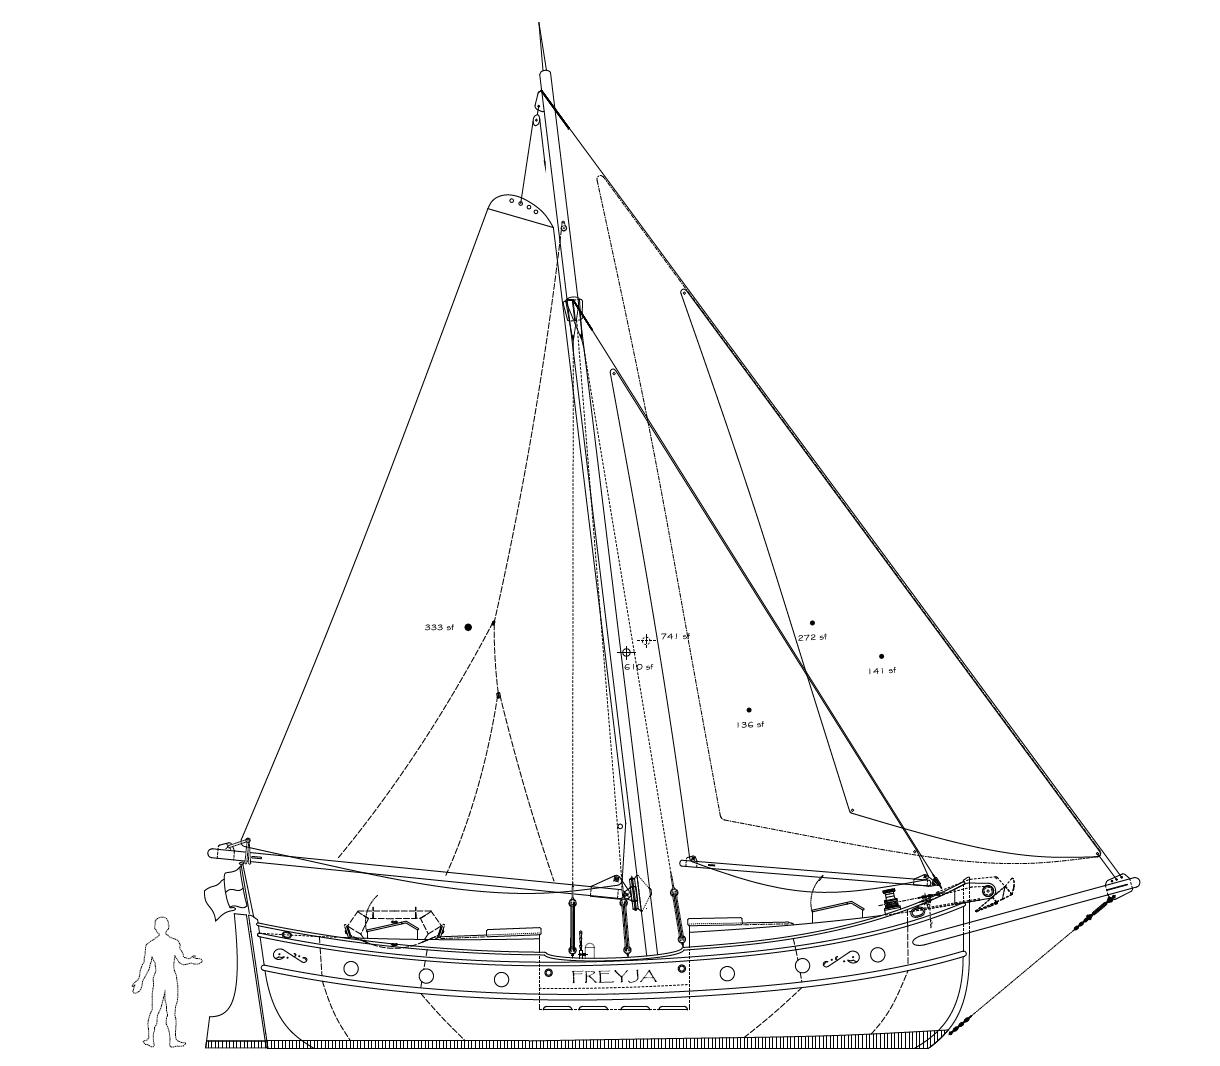 33' FREYJA - A Pelagic Sailing Yacht